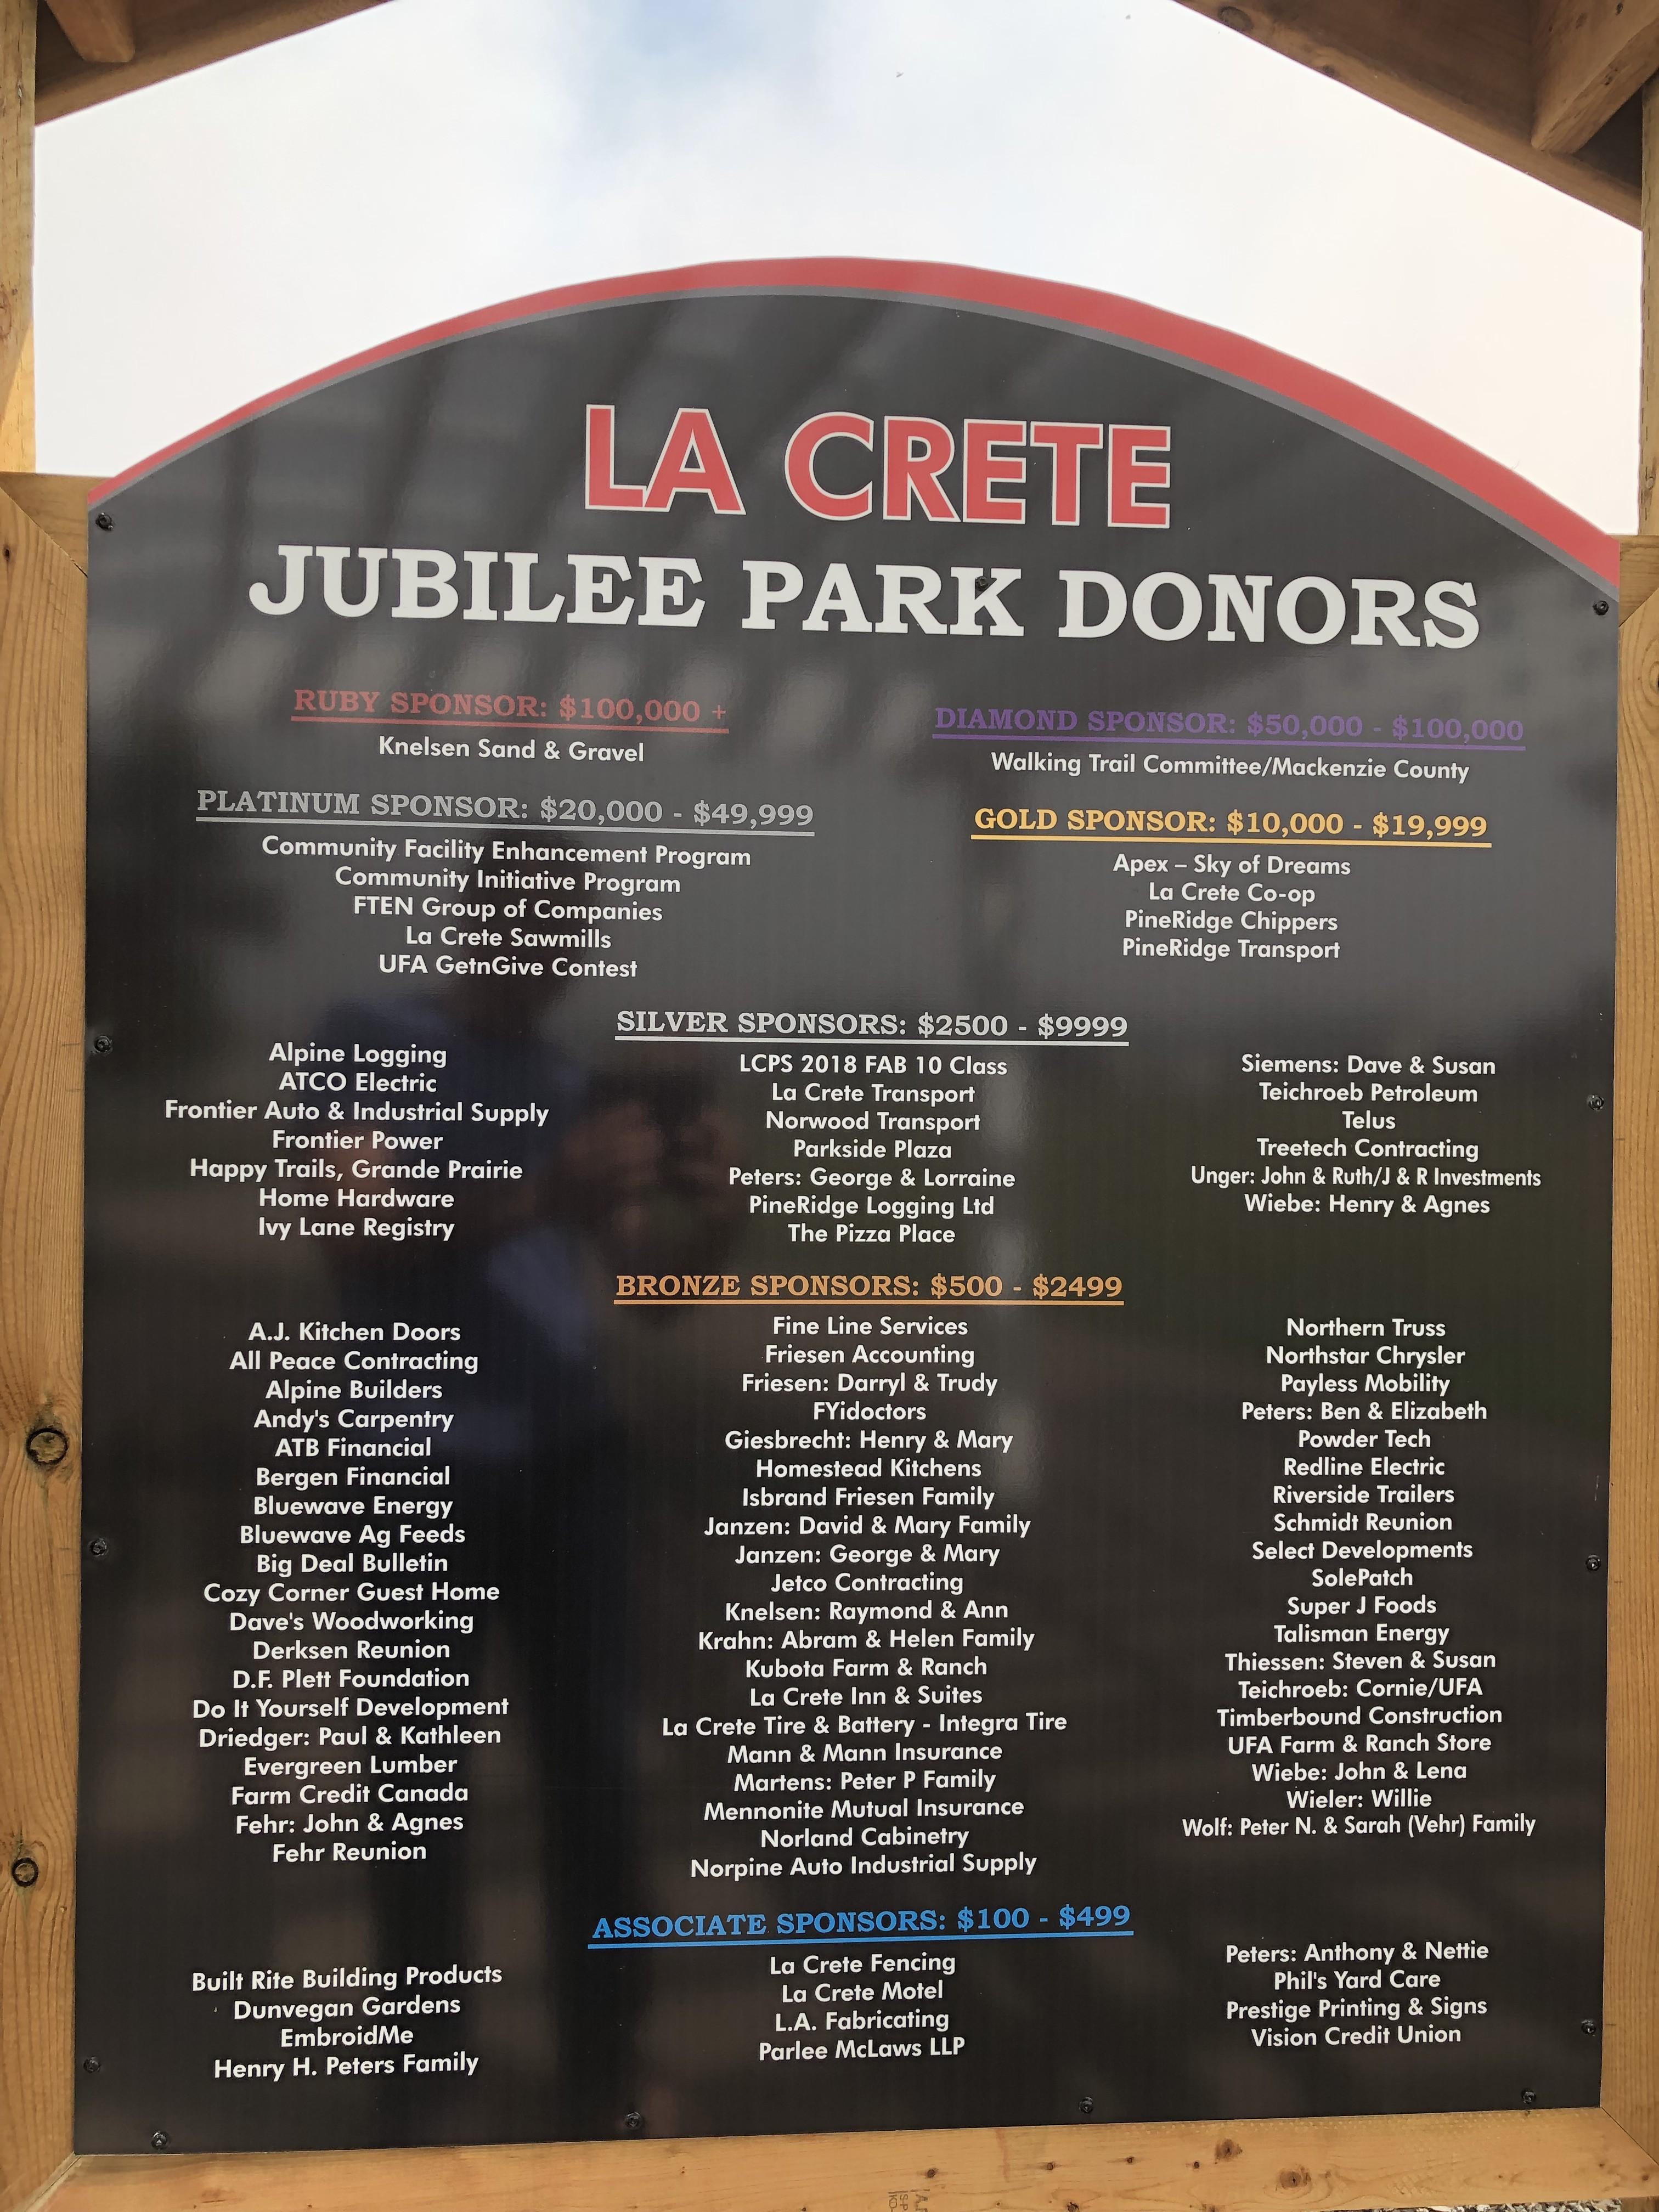 Jubilee Park Sponsorship Plaque